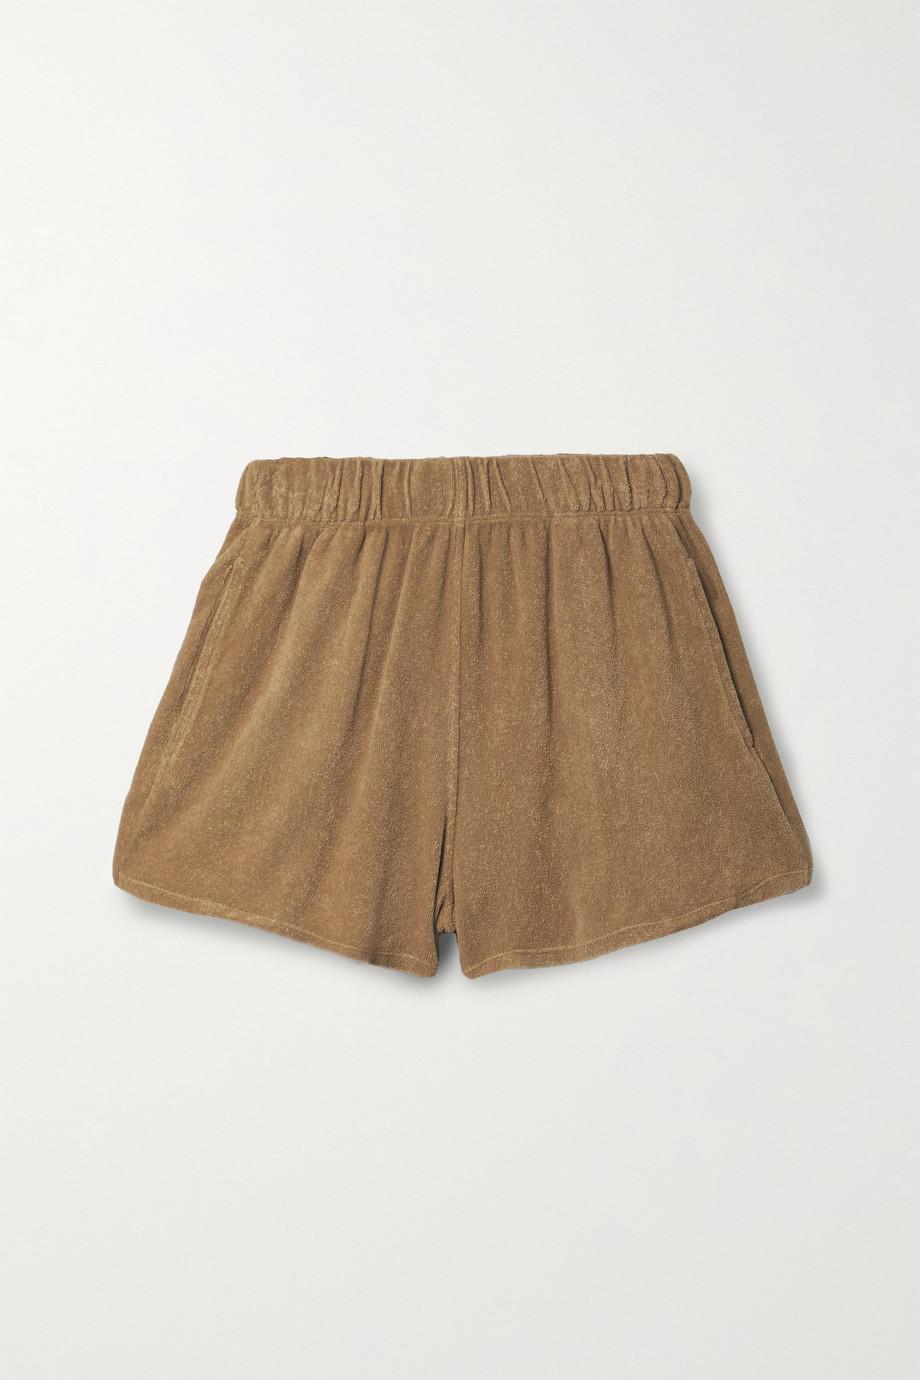 Suzie Kondi Short en molleton de coton biologique